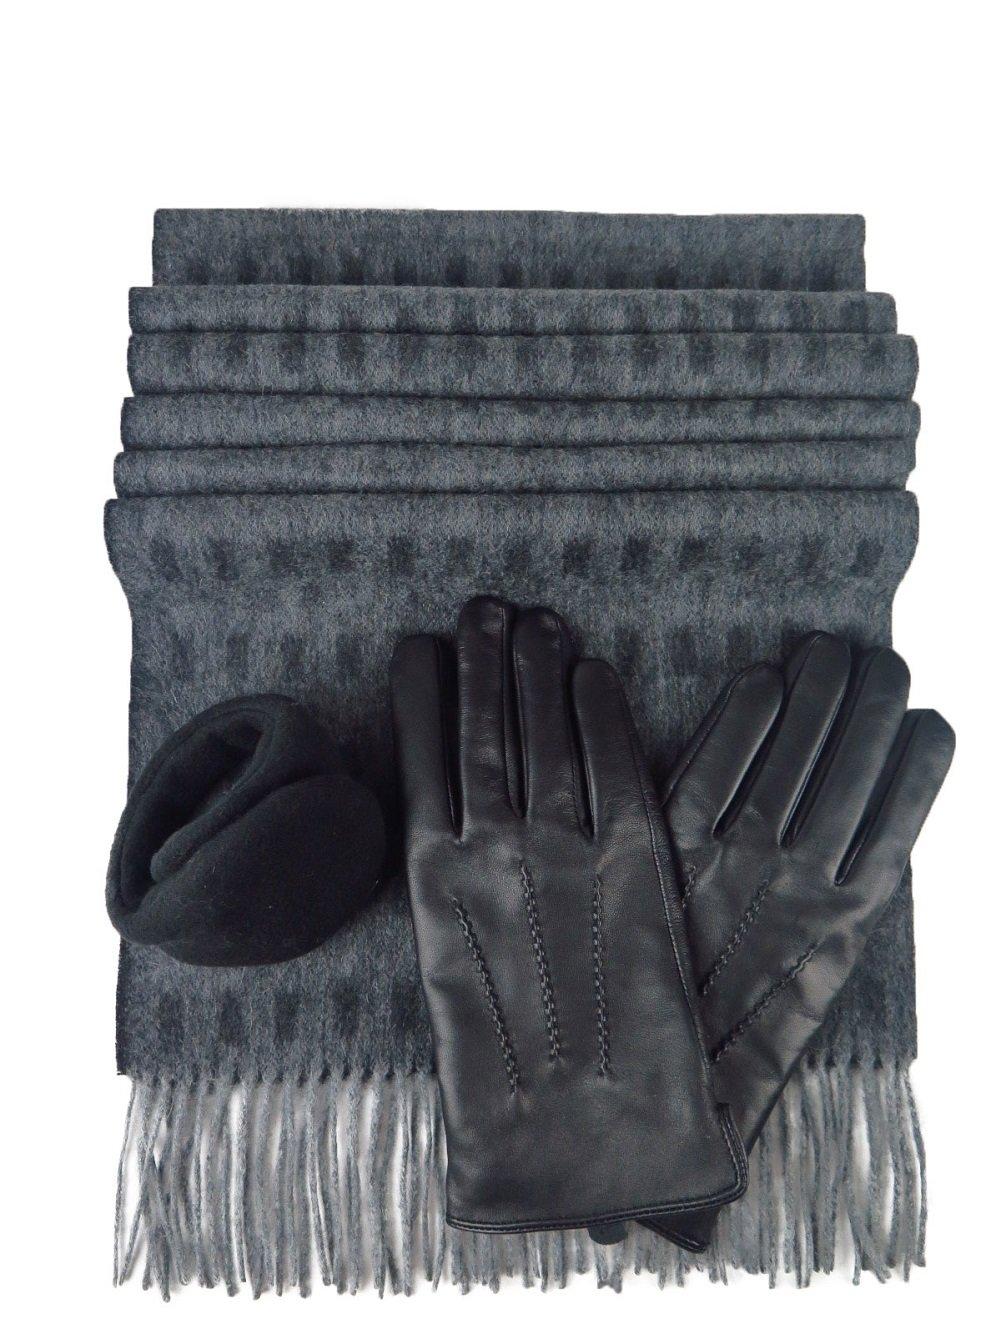 Men's Black Leather Glove Wit Rabbit Fur & 100% Cashmere Scarf & 180s Ear Warmer Set (Gray&black3, large)